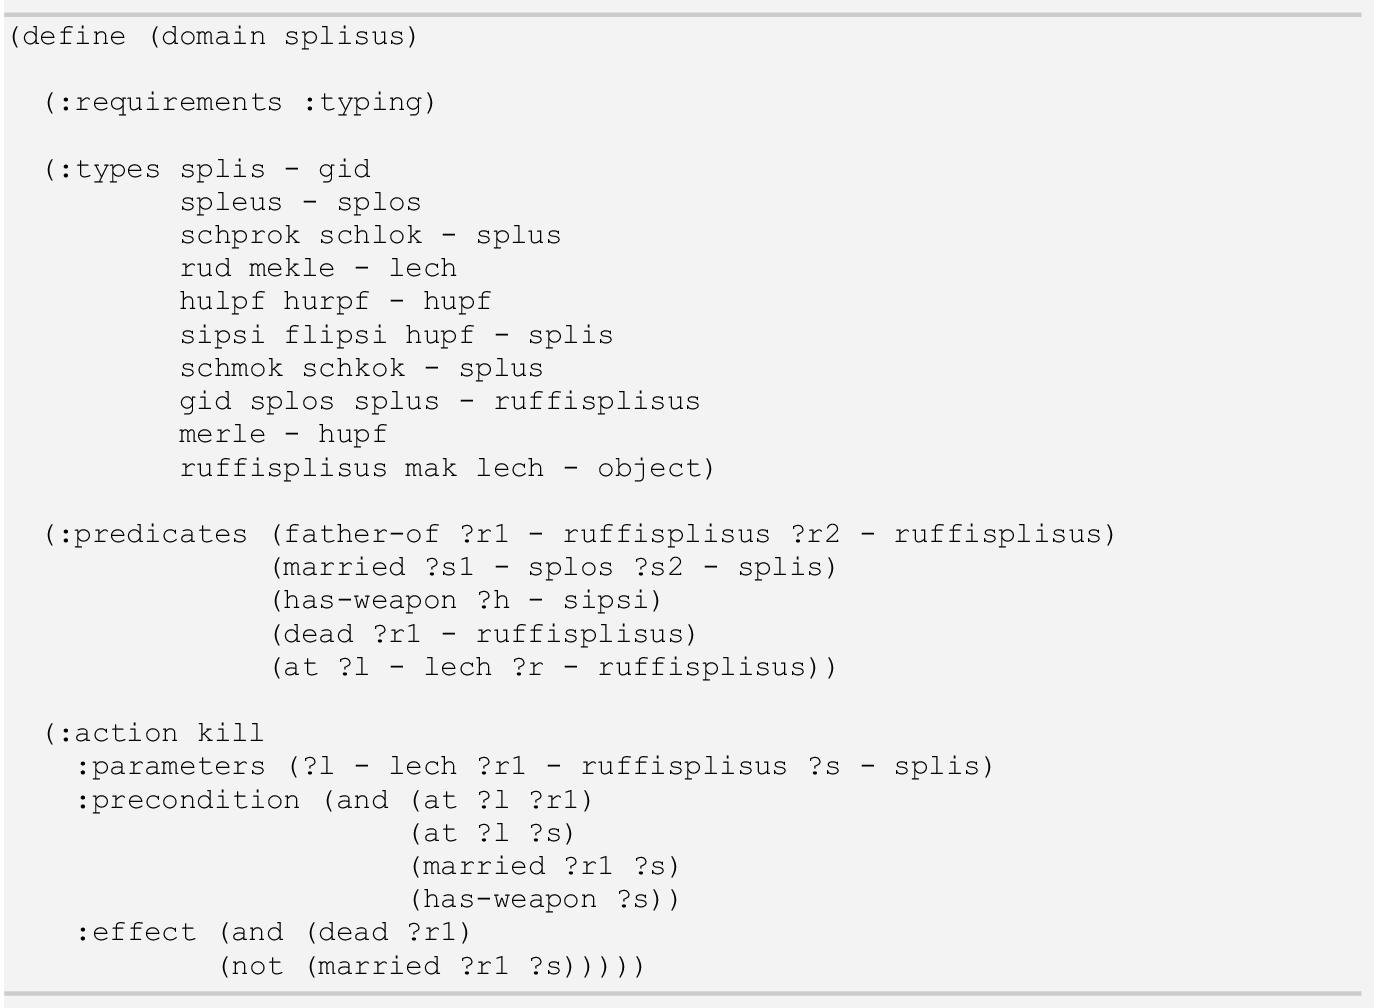 https://static-content.springer.com/image/chp%3A10.1007%2F978-3-030-38561-3_4/MediaObjects/486735_1_En_4_Figi_HTML.png